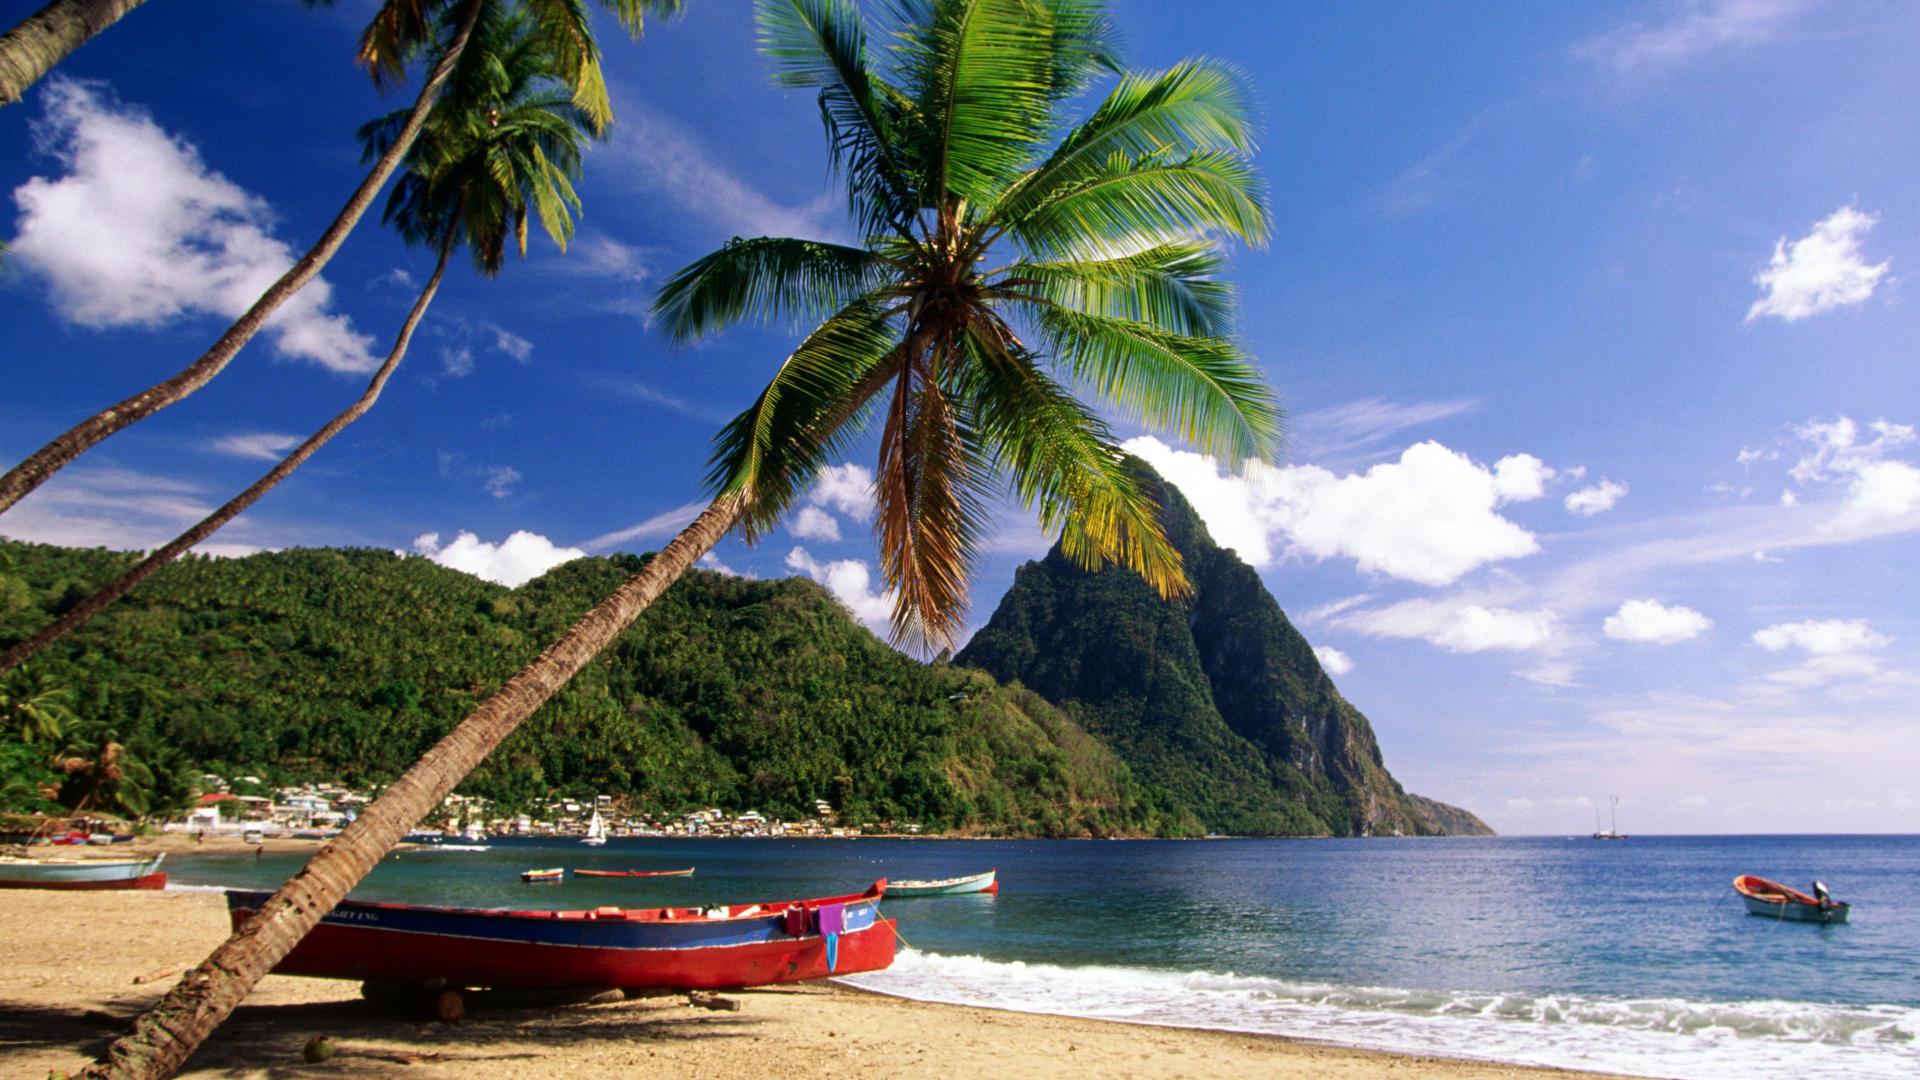 Beach Desktop Backgrounds and Wallpaper   Caribbean Escape St Lucia 1920x1080